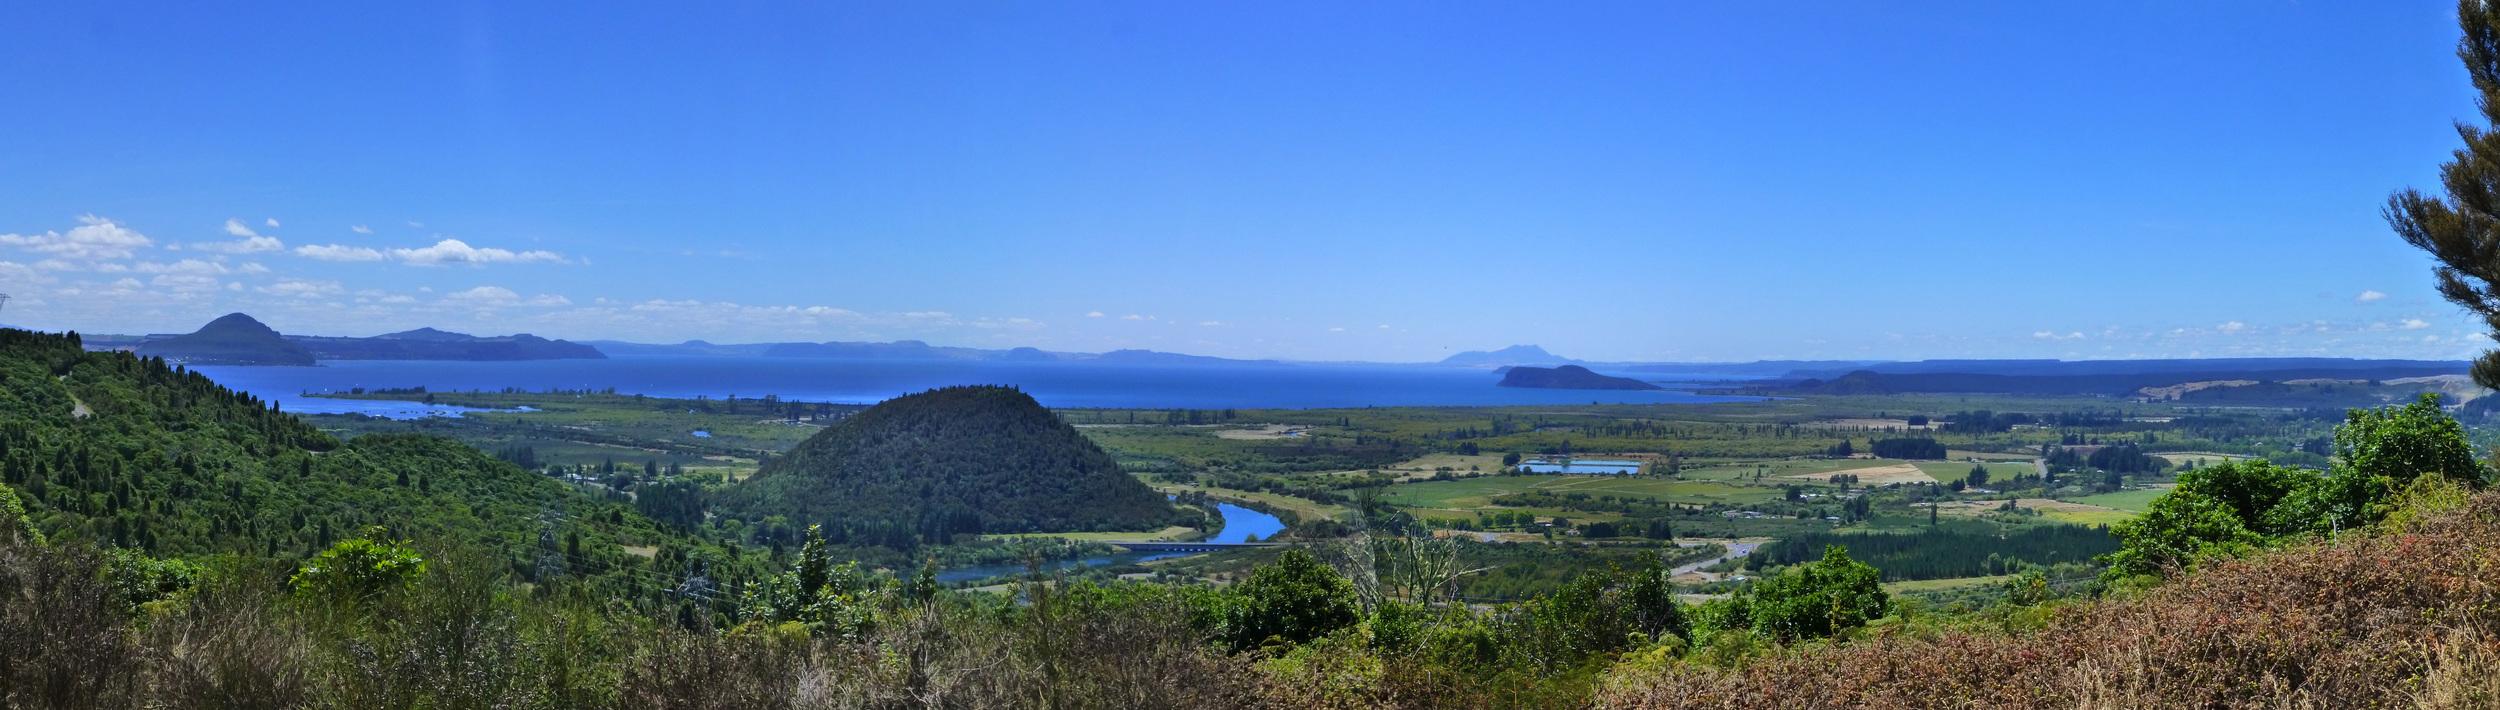 Lake Taupo Awaits